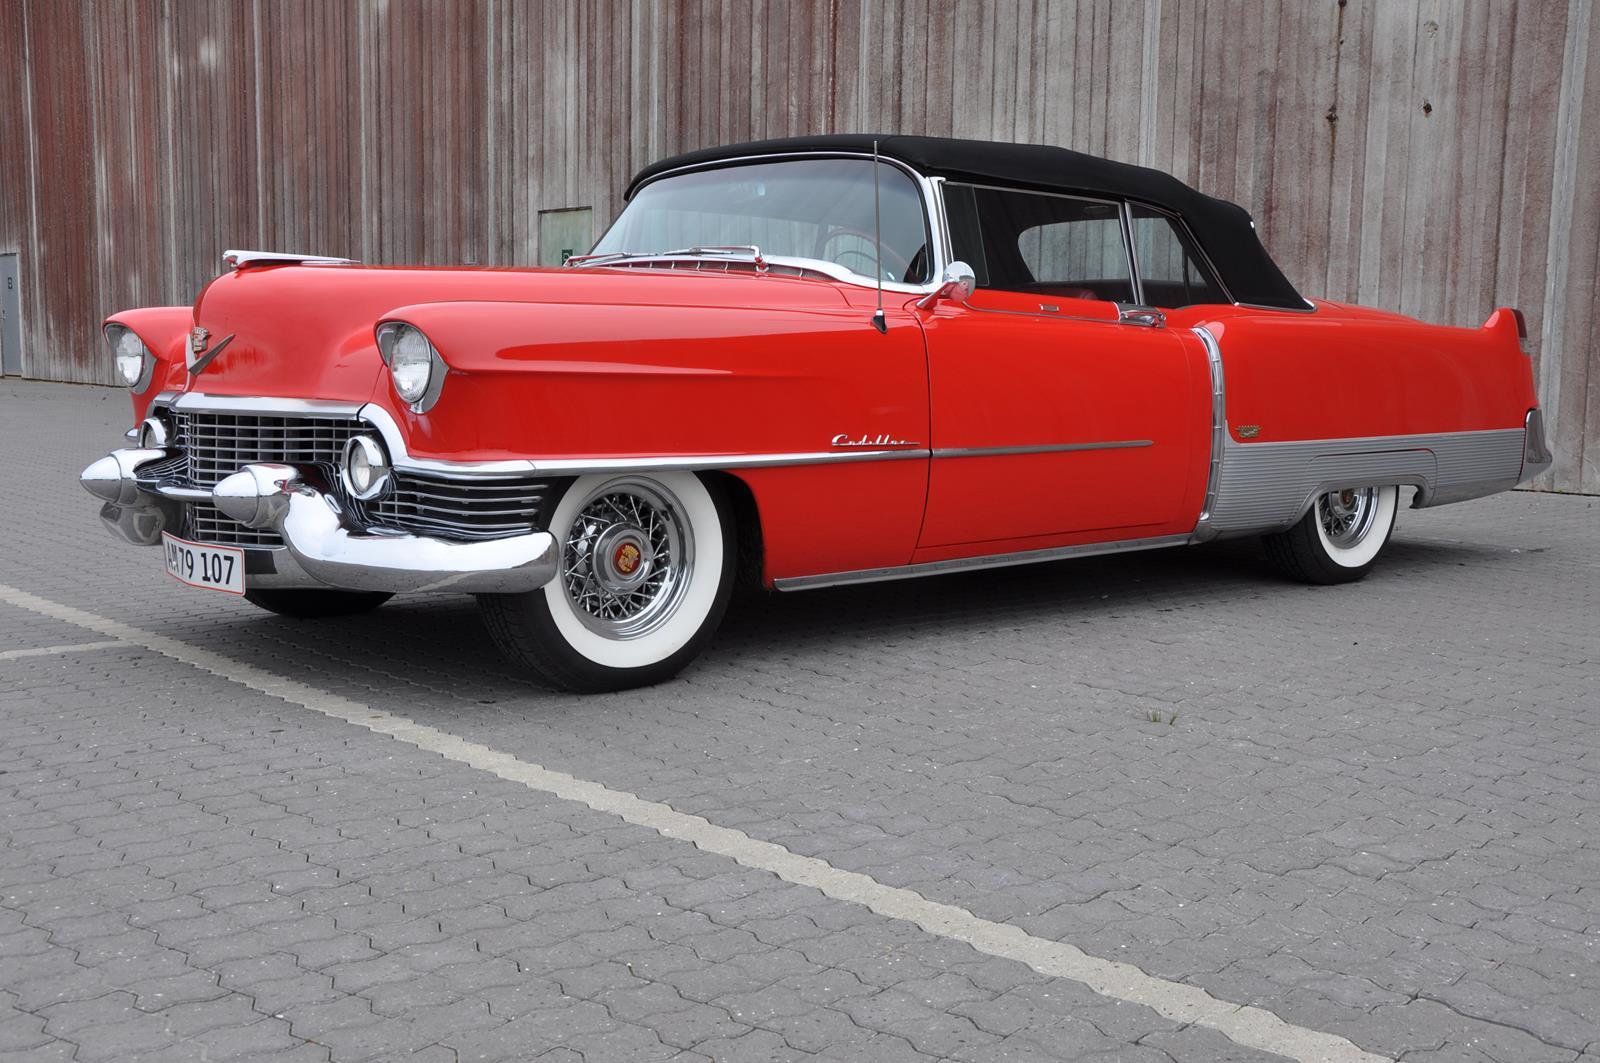 1954 cadillac eldorado convertible classic motor sales. Black Bedroom Furniture Sets. Home Design Ideas